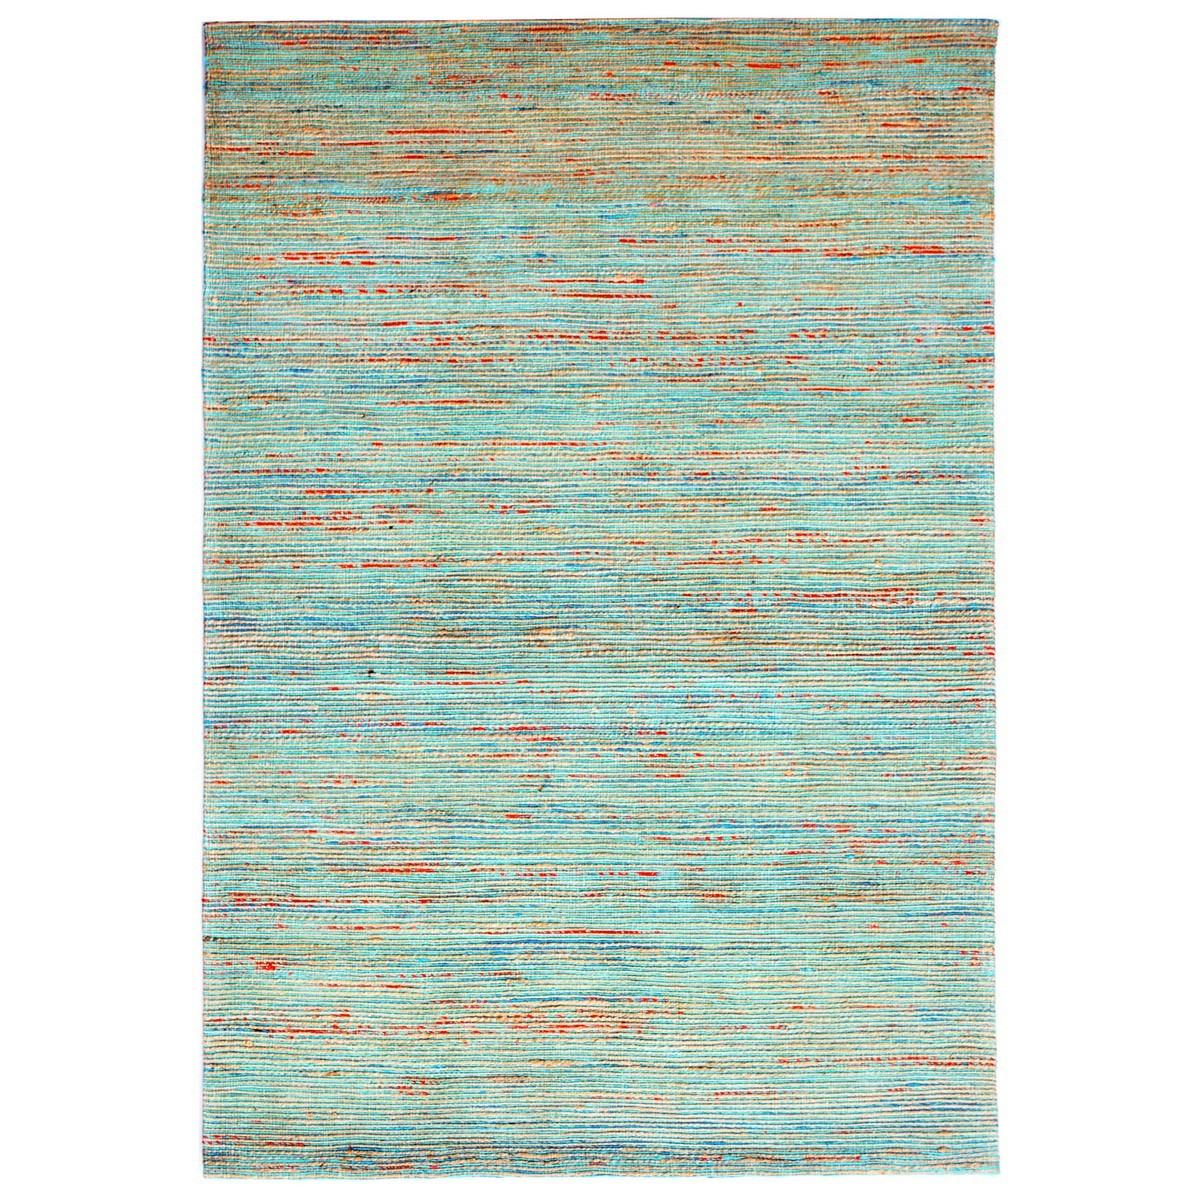 Kerla Horizon Handwoven Silk & Jute Rug, 160x110cm, Natural / Aqua